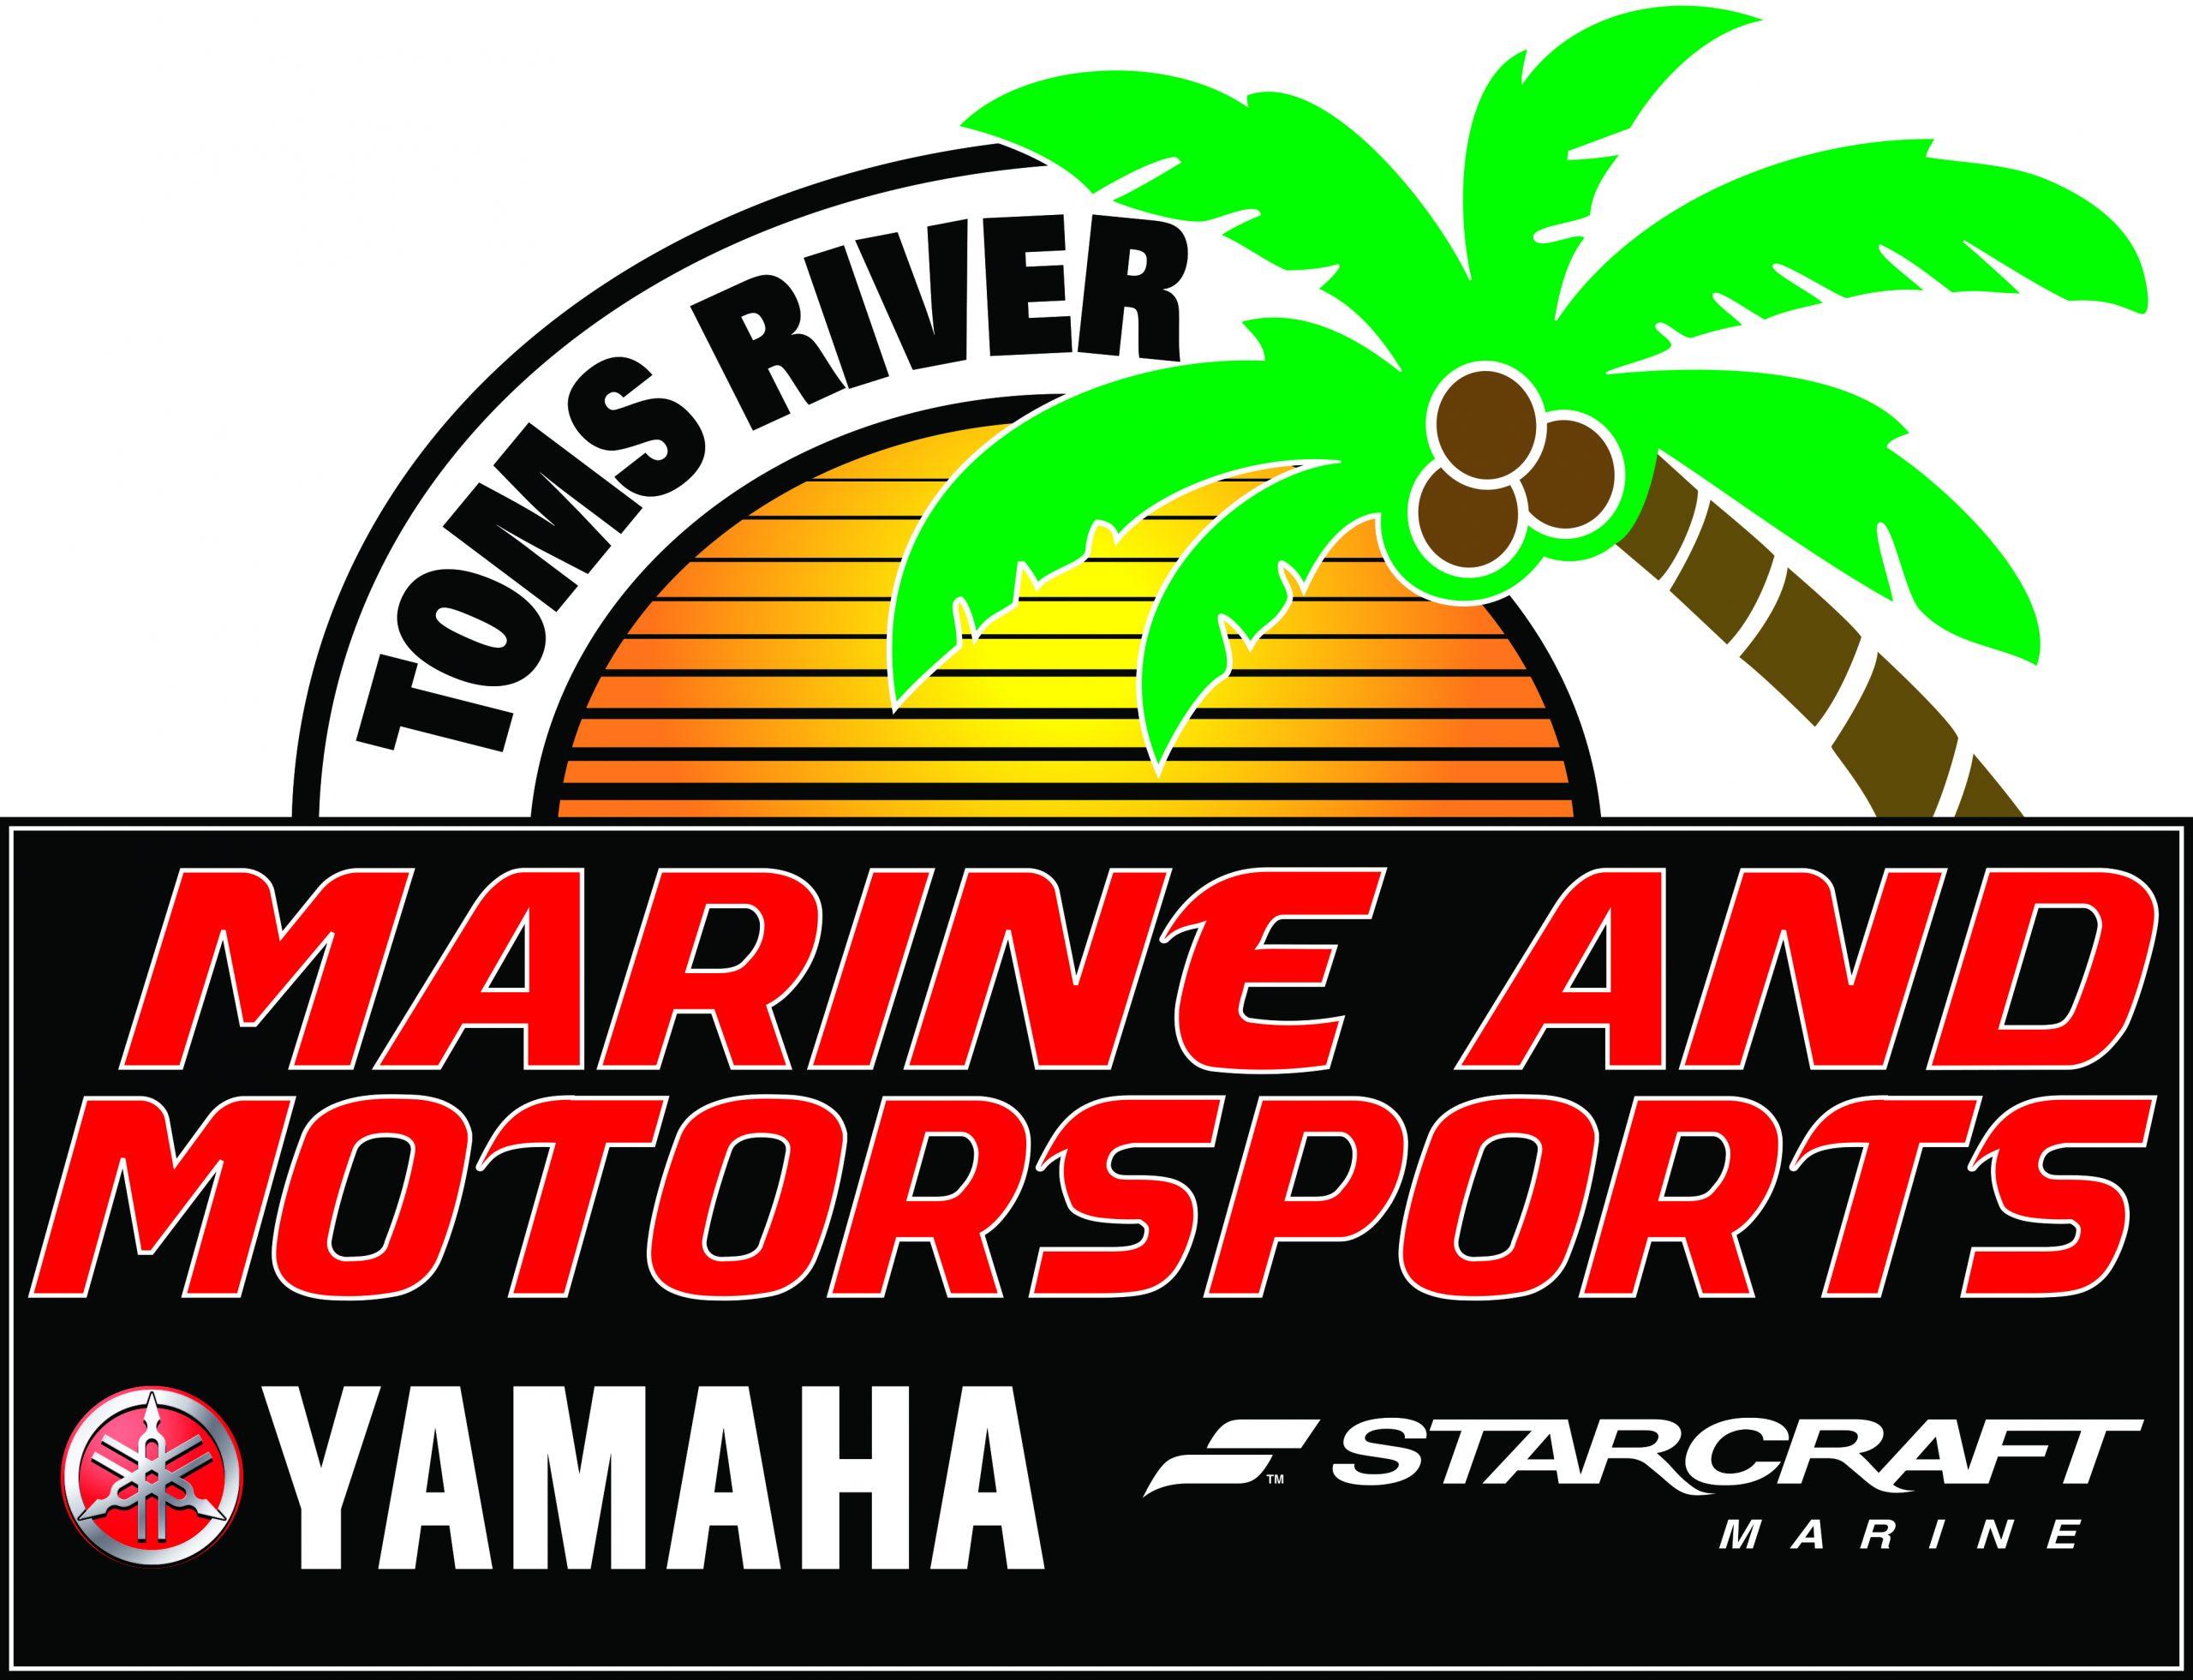 Toms River Marine Motorsports